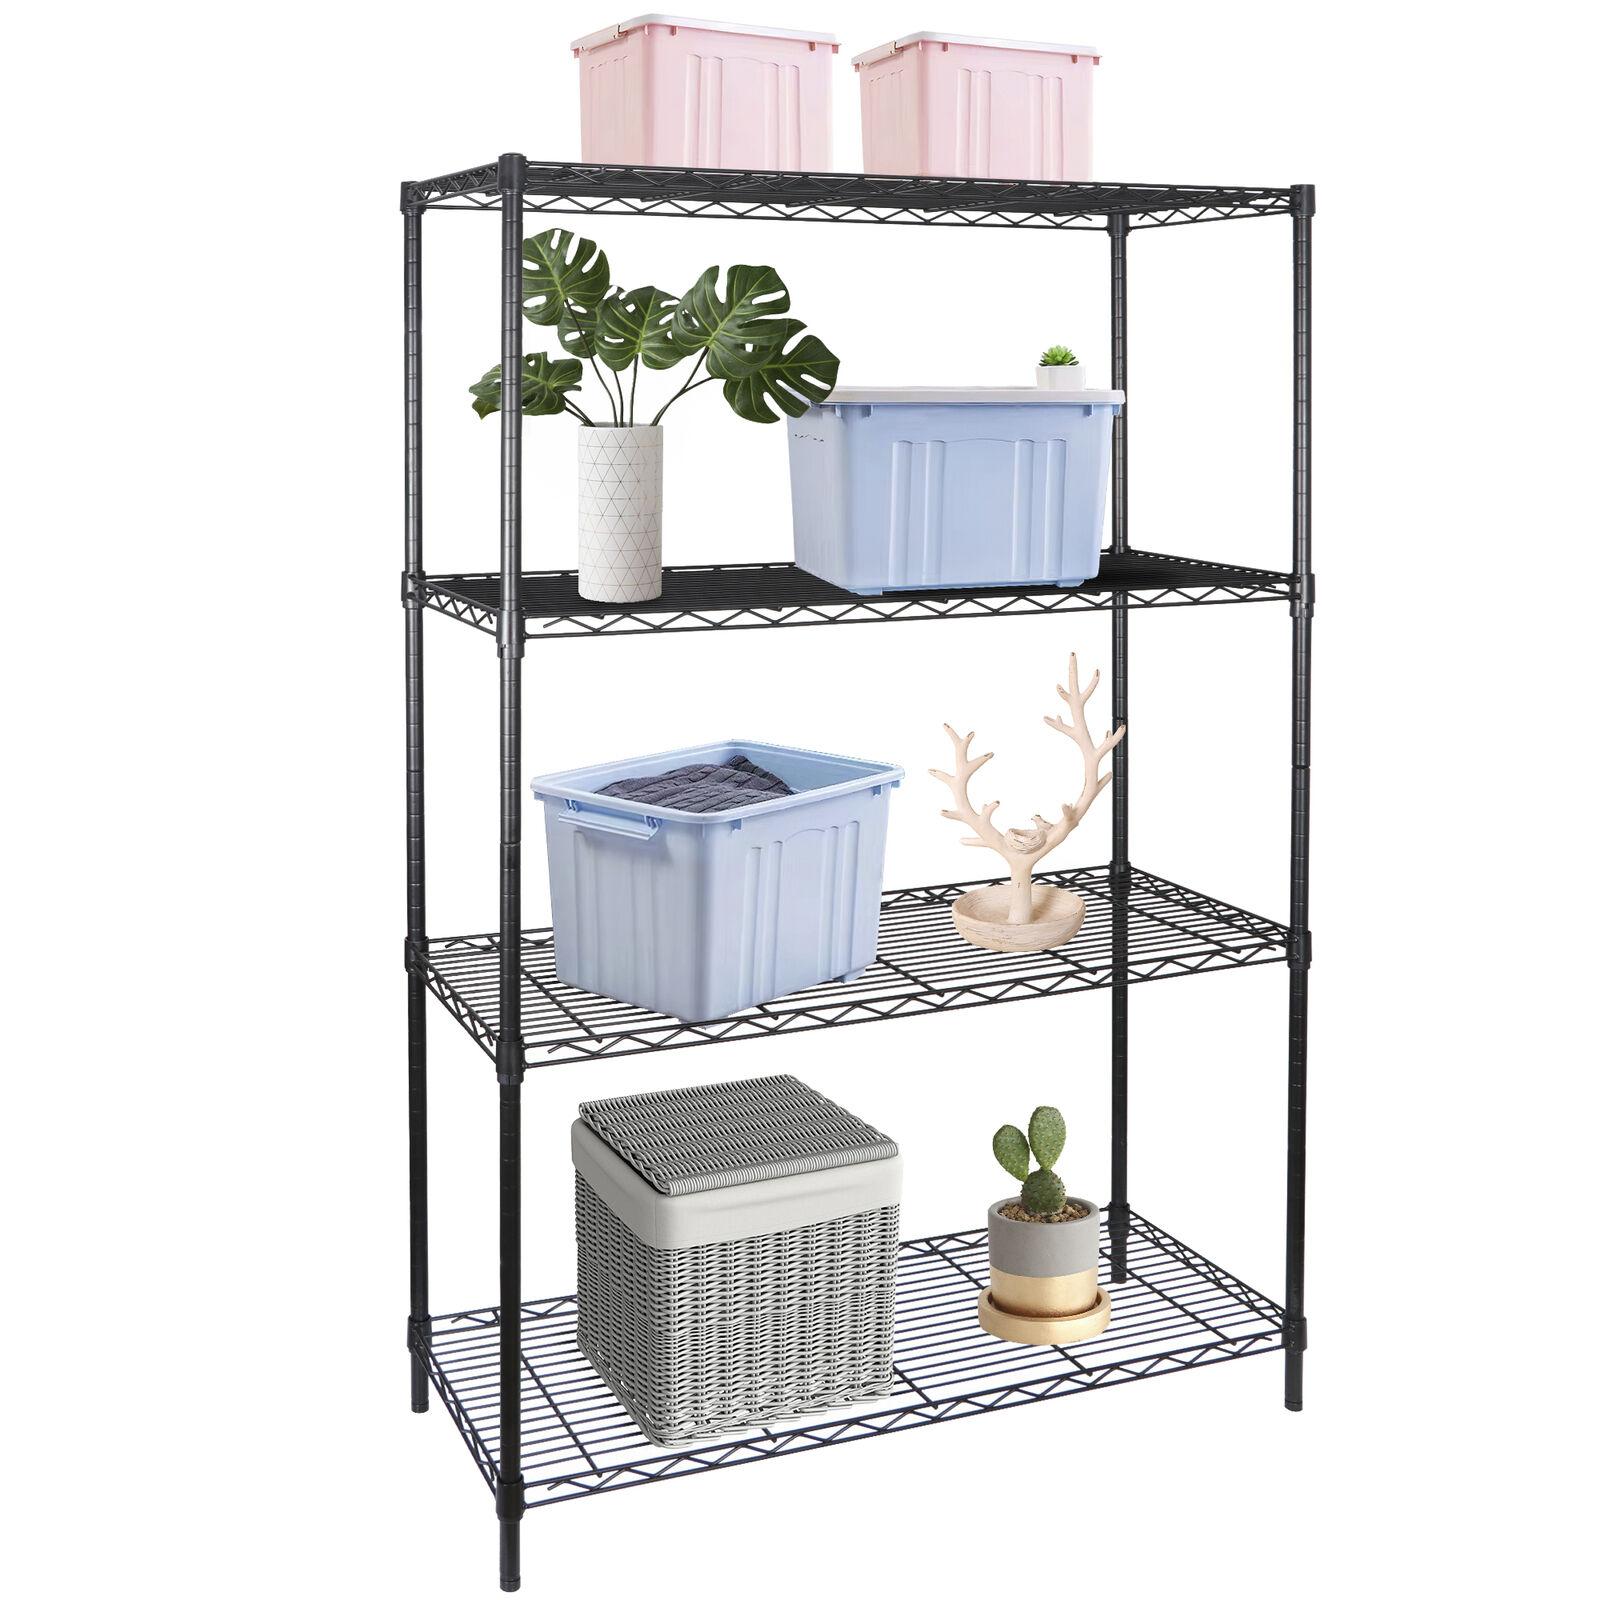 4-Tier Heavy Duty Storage Shelves Garage Shelf Metal Shelving Organization Home & Garden